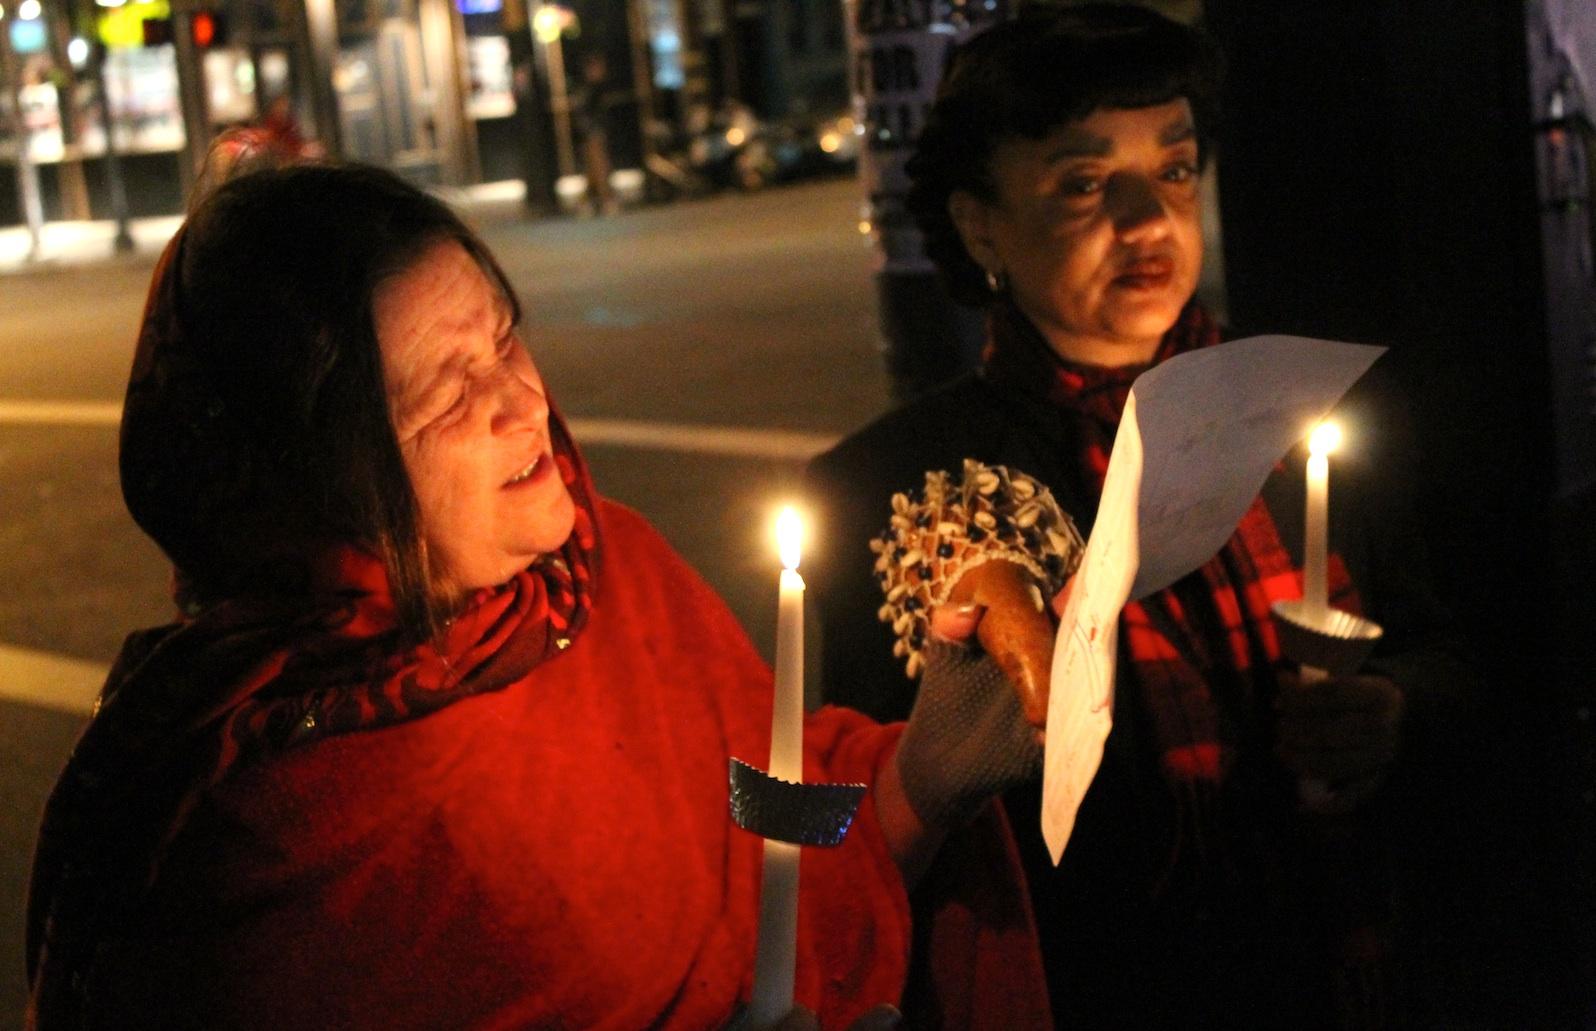 Patty Davis (left) surveys the route of the Las Posadas procession along 24th Street.